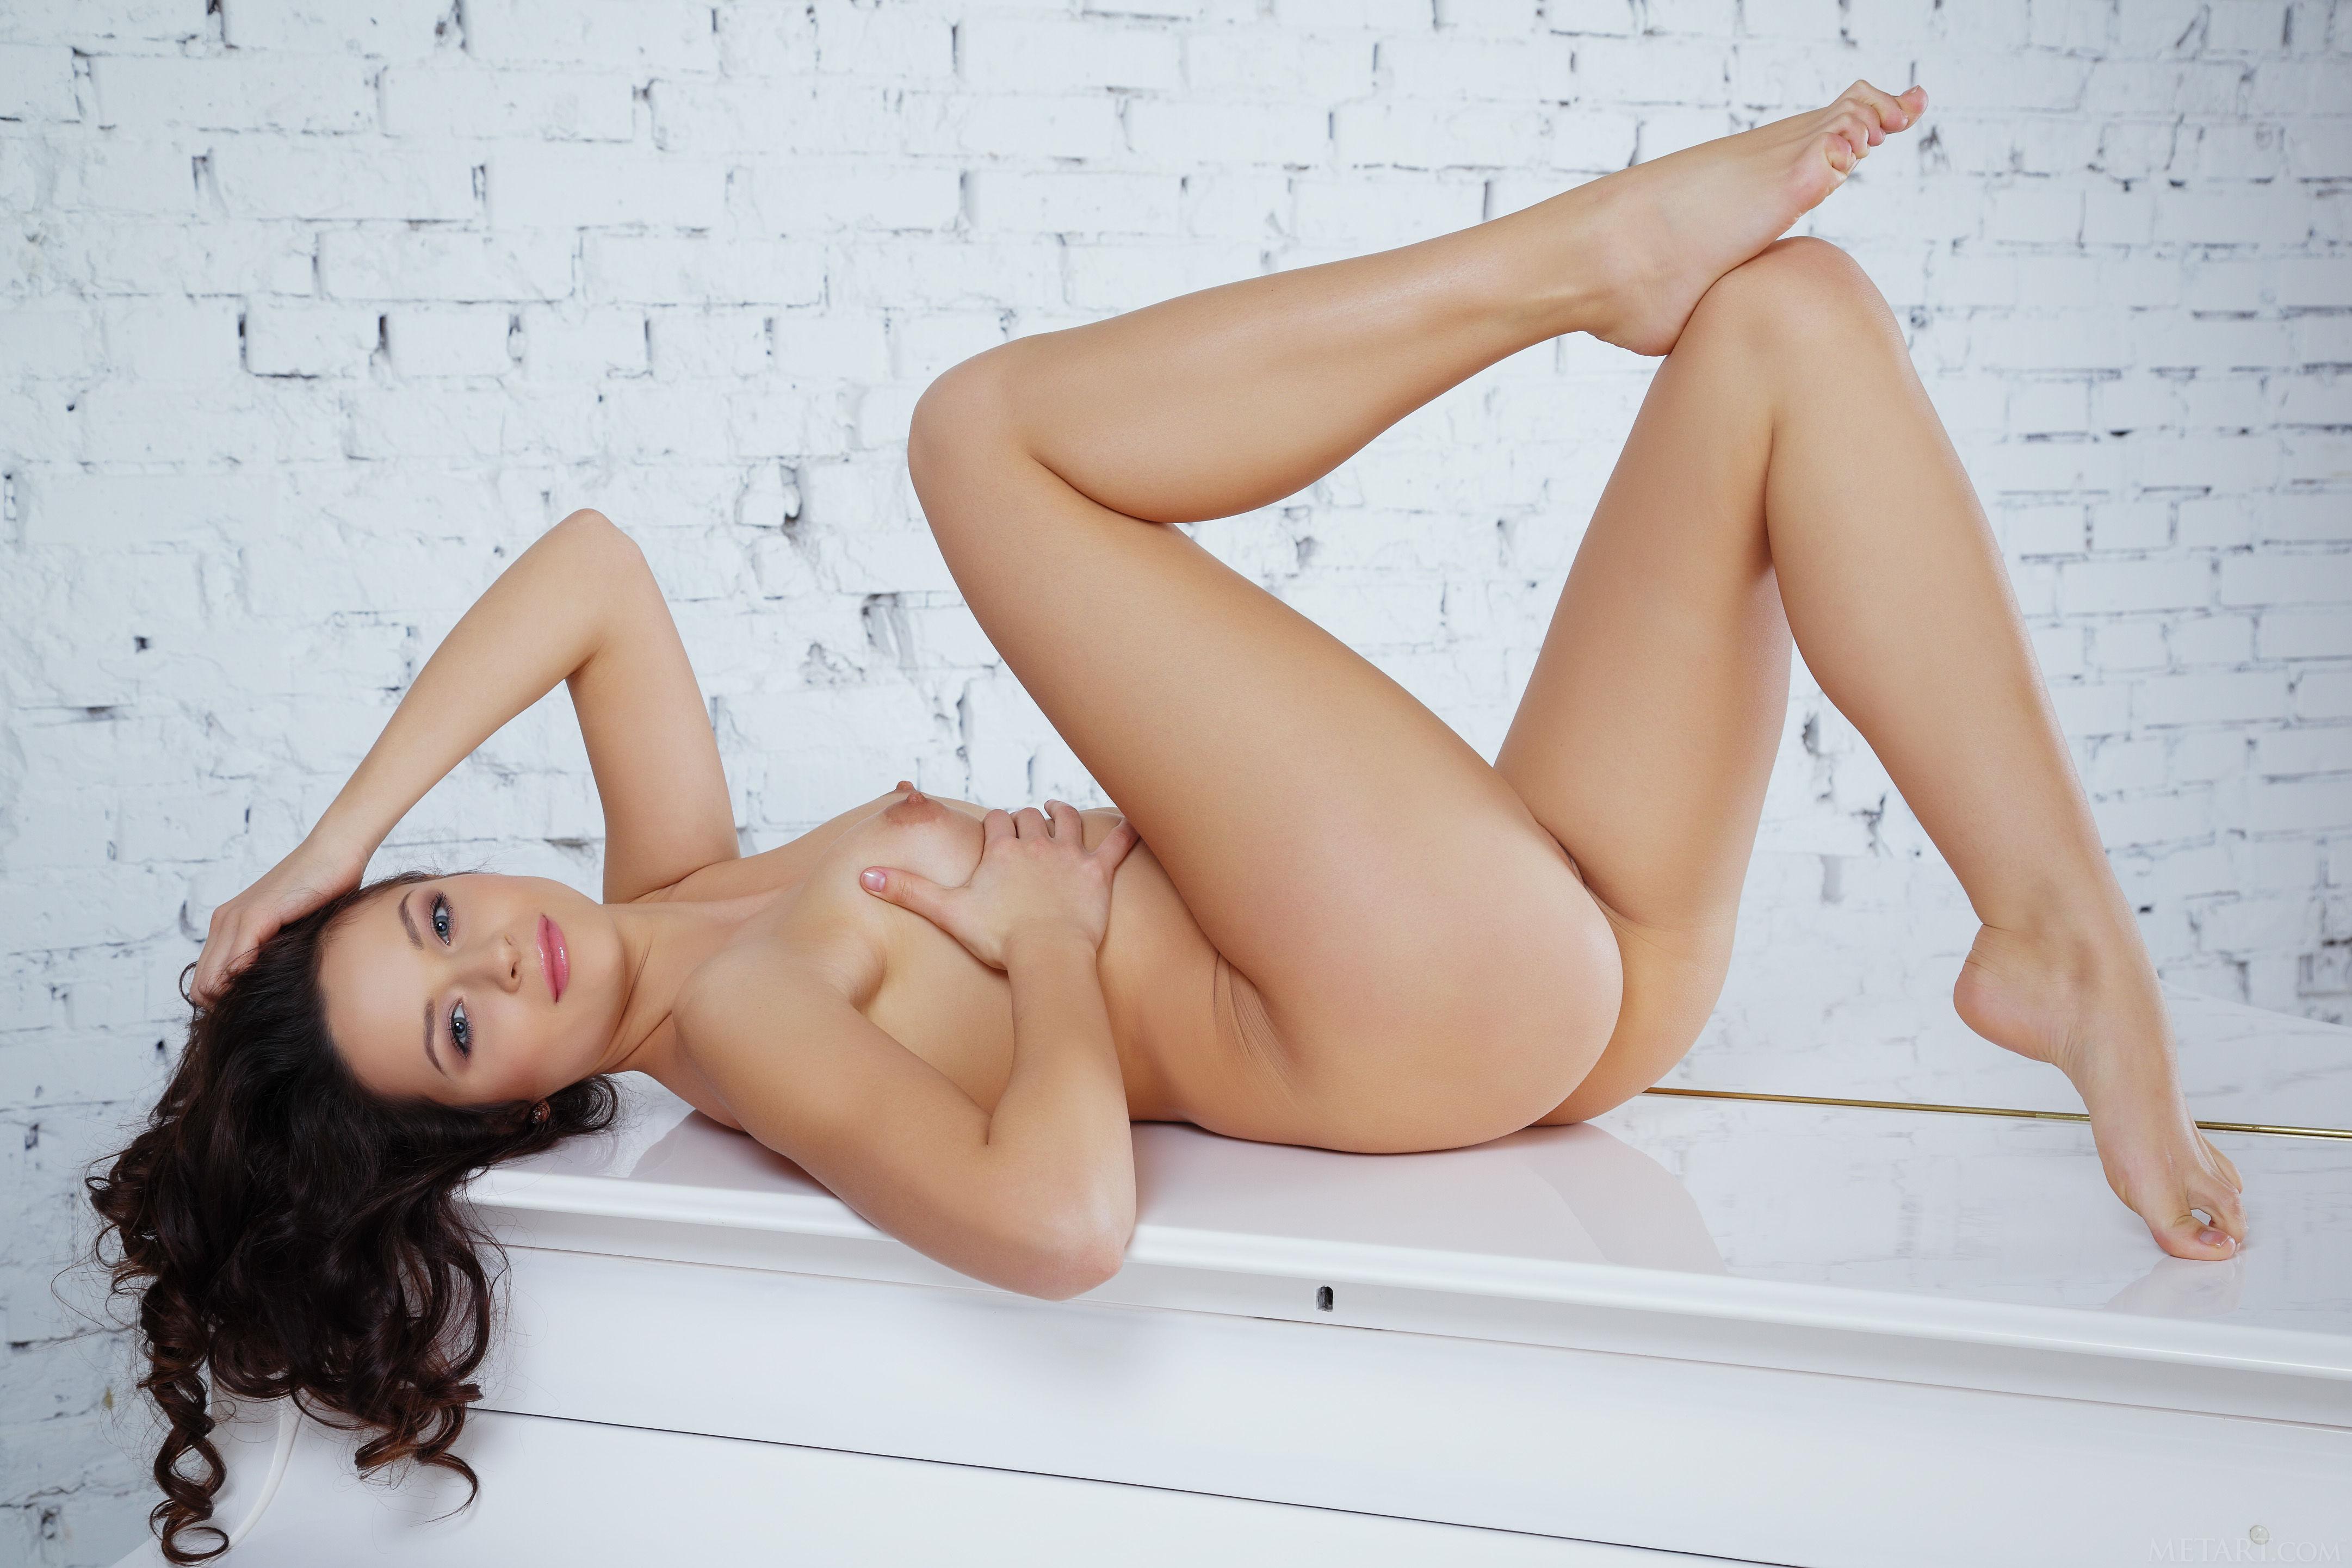 kayla synz is looking for pleasure